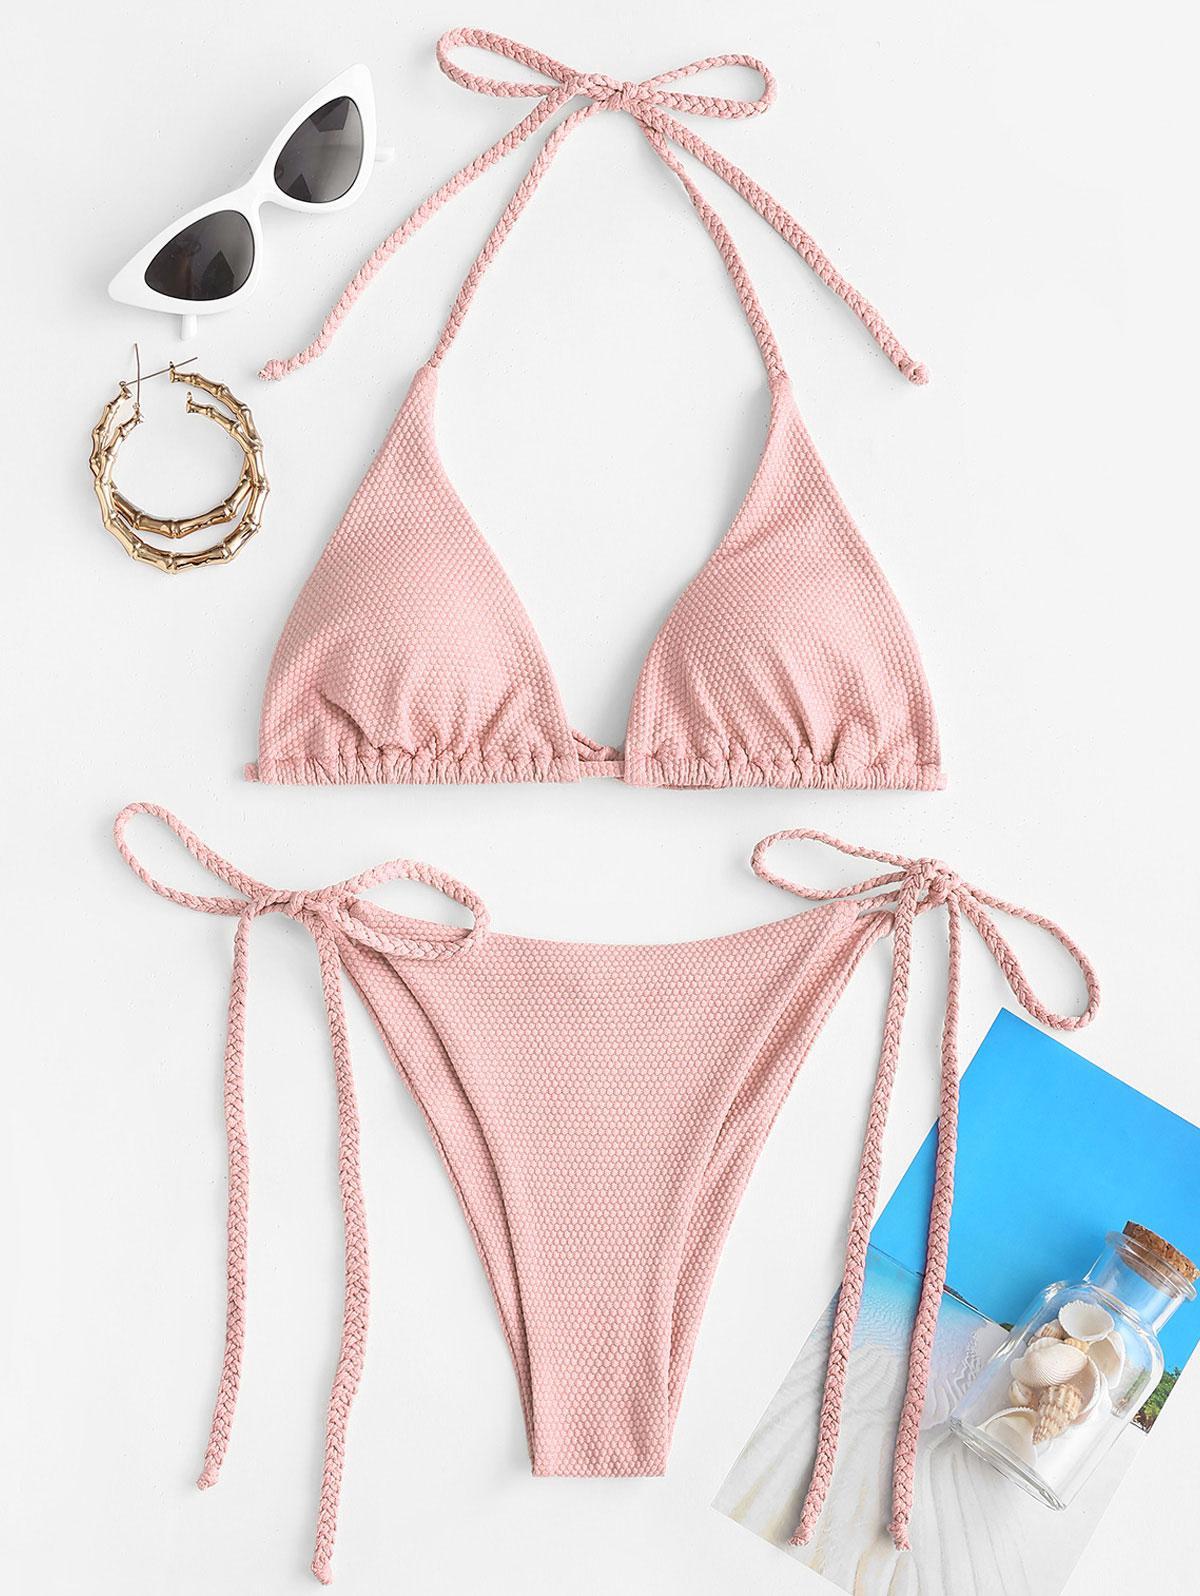 ZAFUL Braided Textured Tie Side Bikini Swimwear